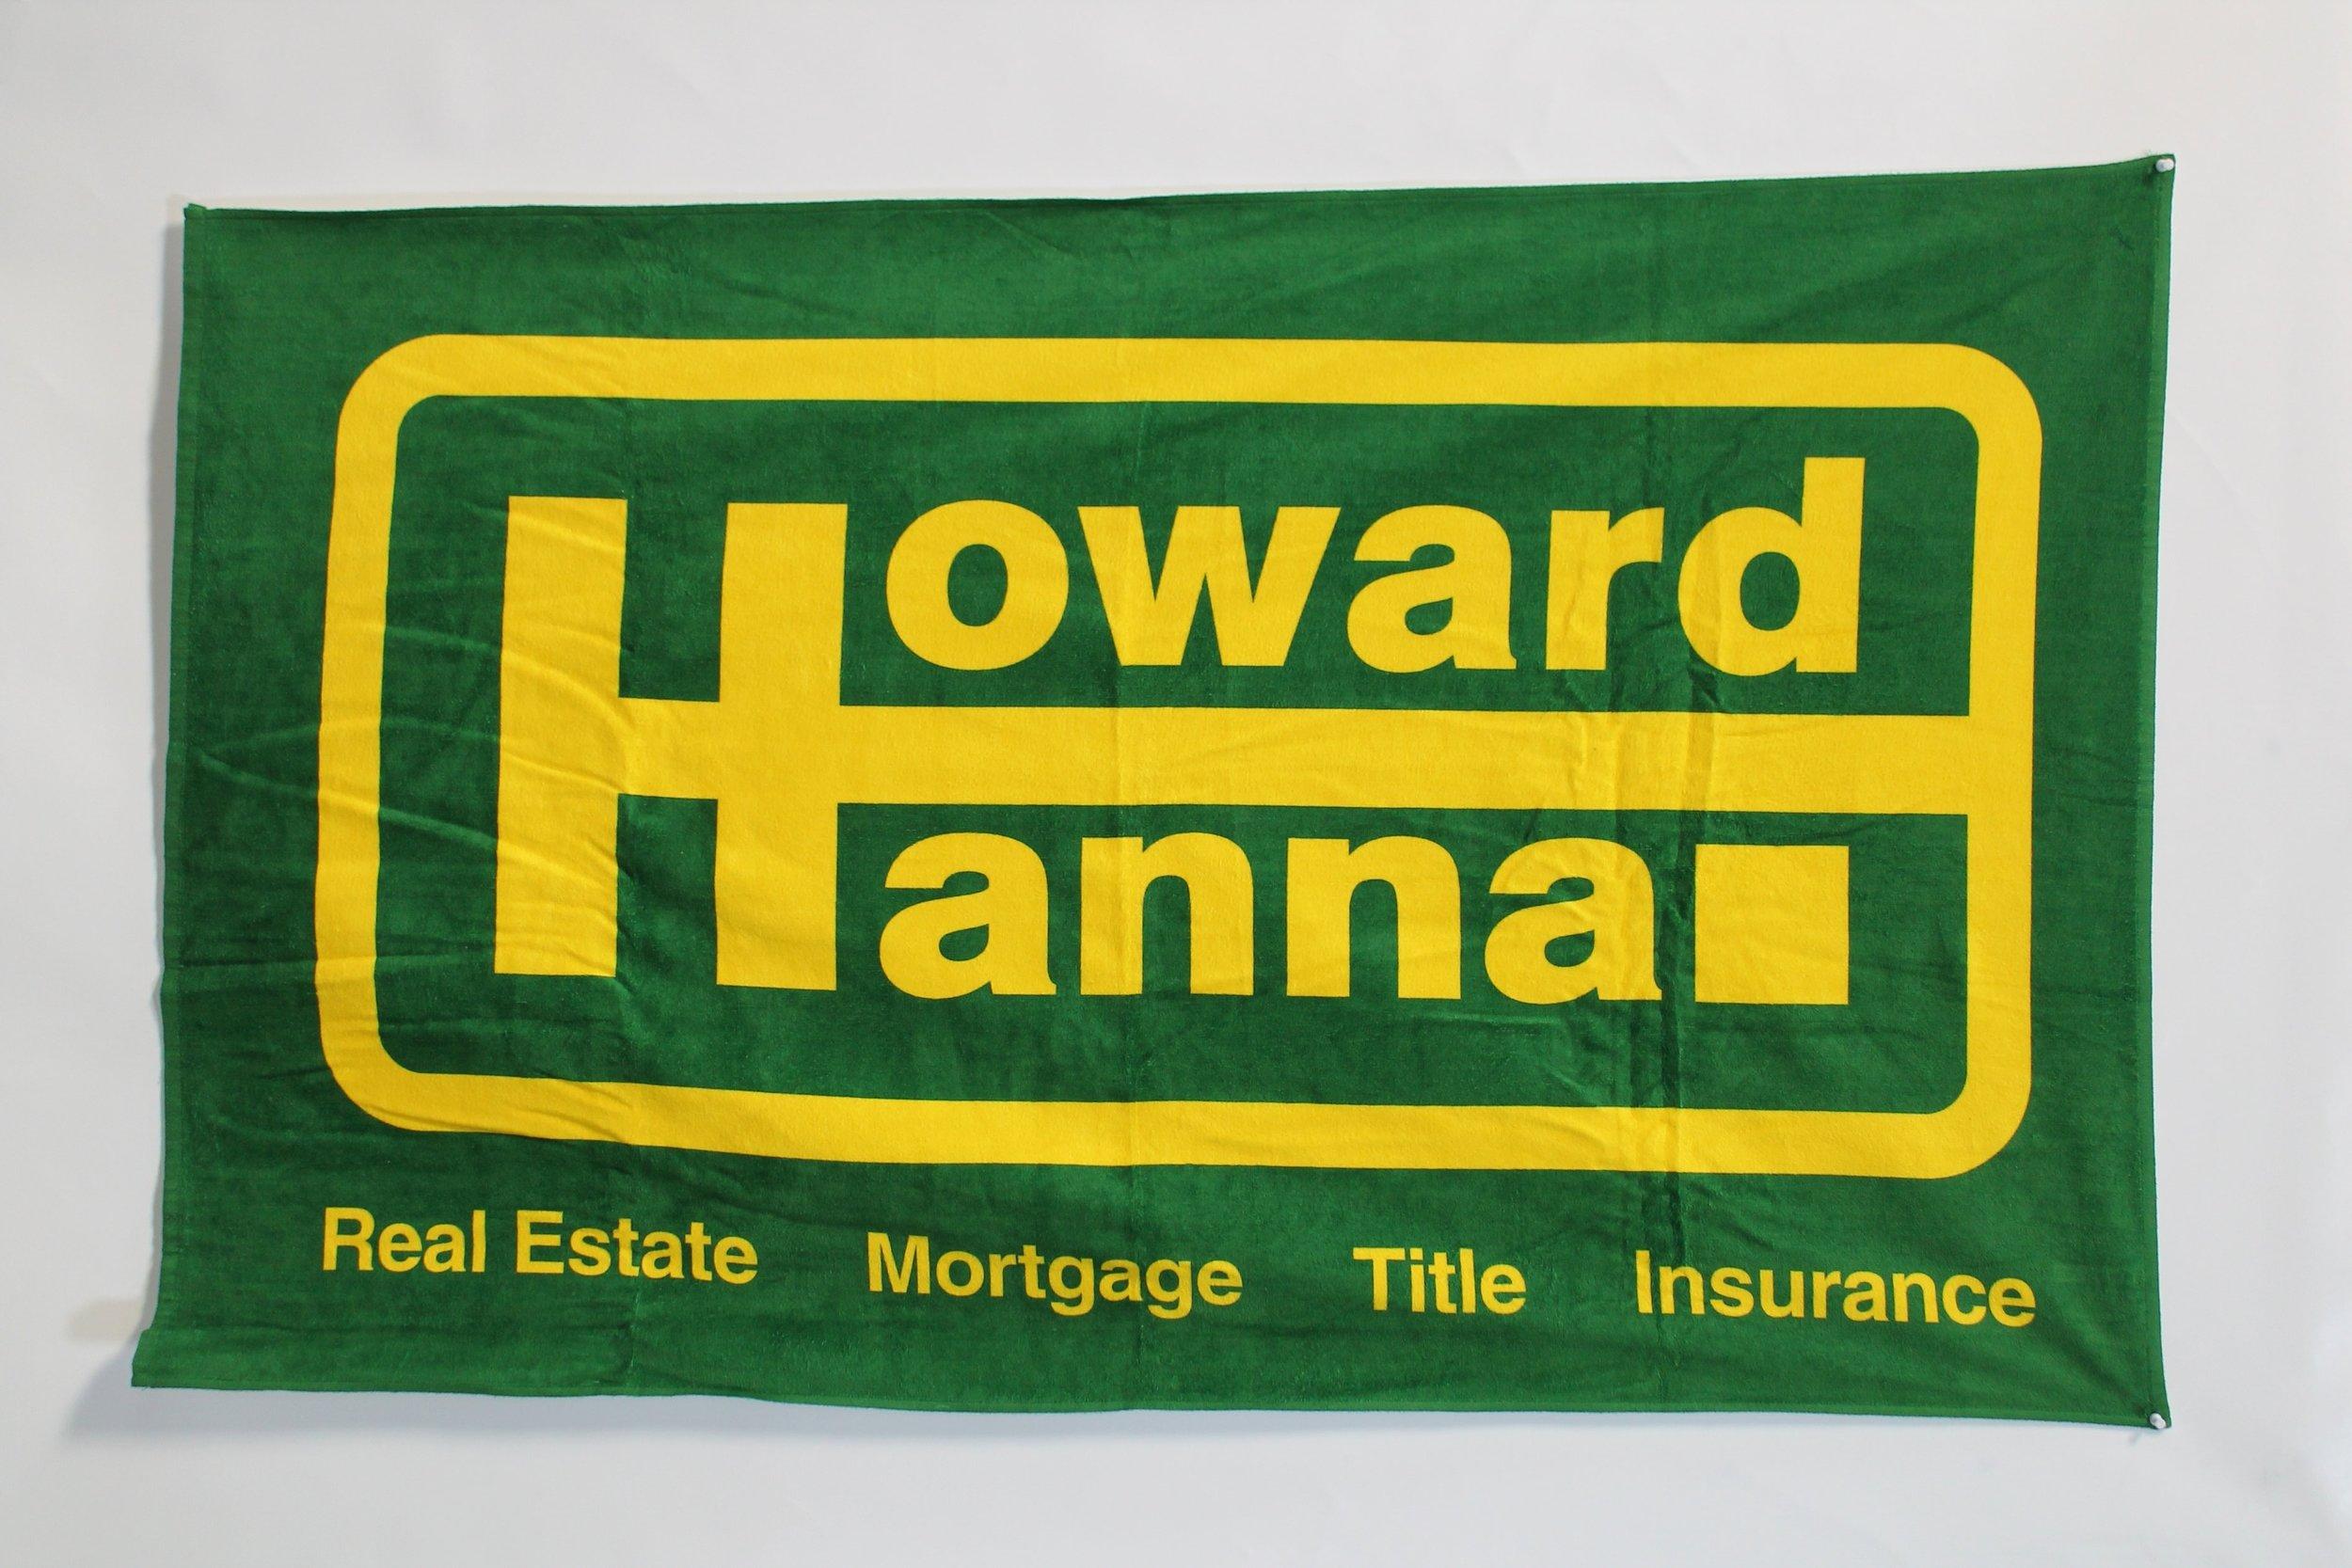 Howard_Hanna_Towels.JPG